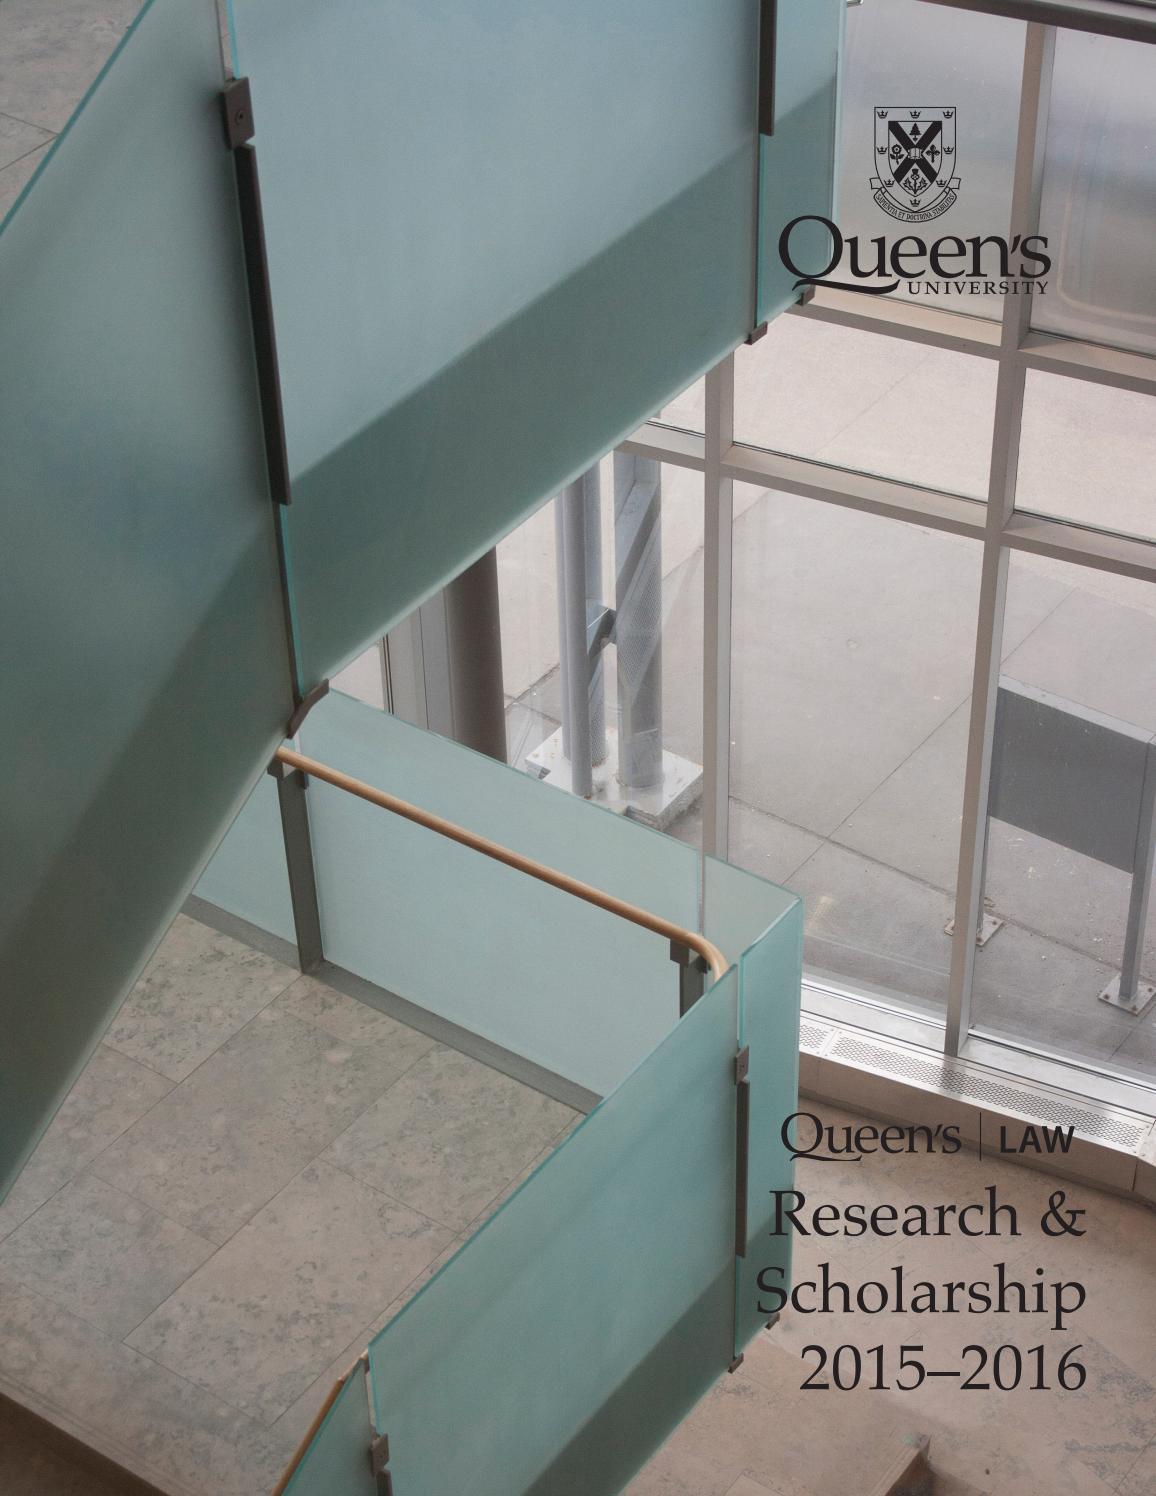 Queen's Law Research Report 2015-16 by Queen's University